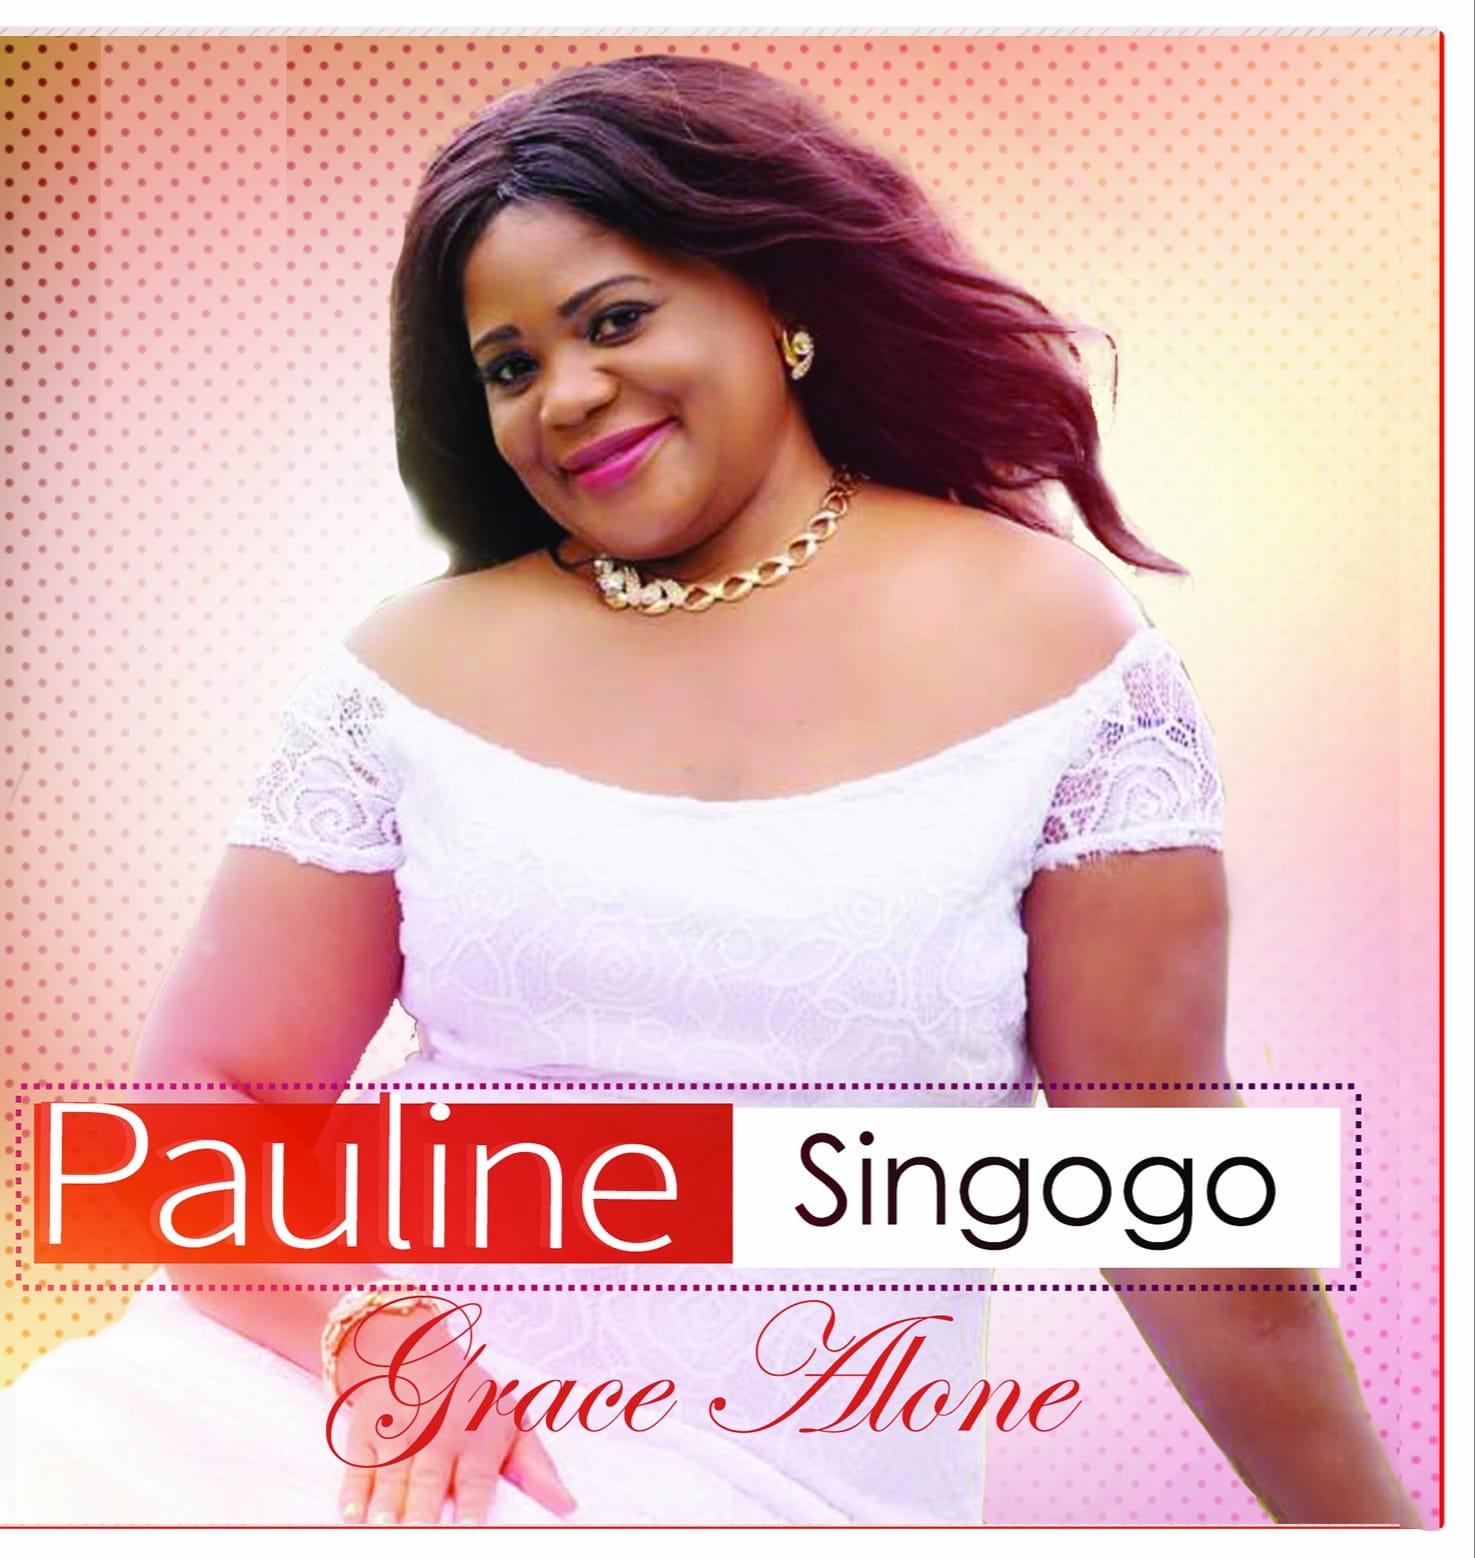 Pauline's biography